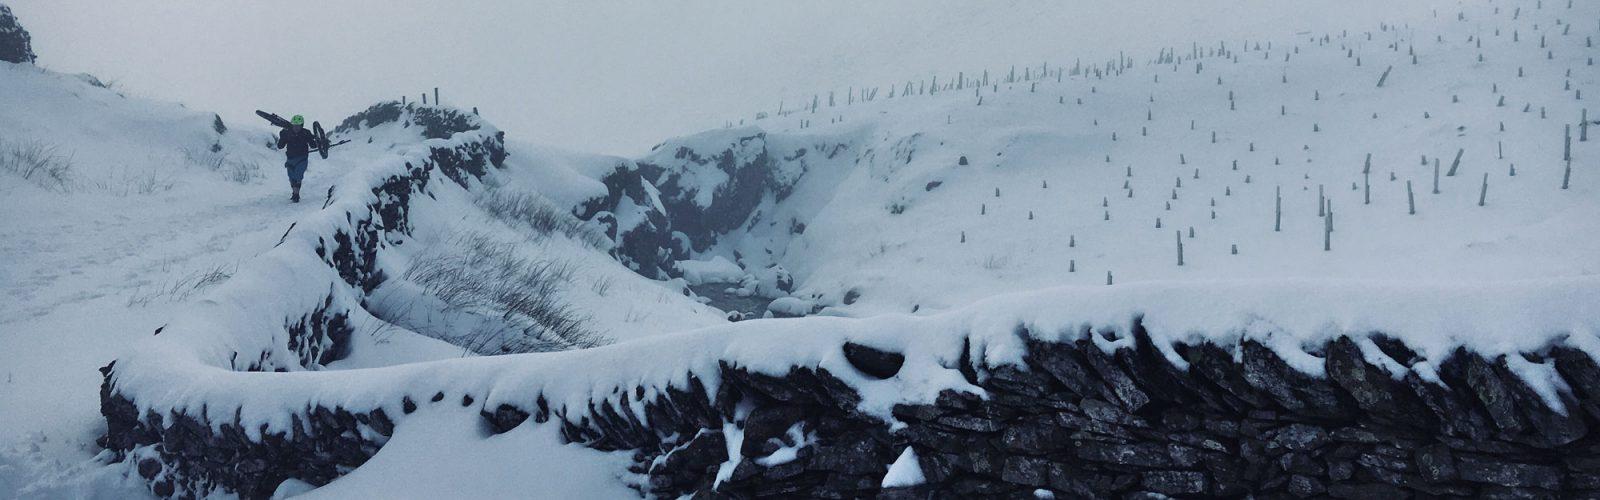 lakesmtb-kentmere-snow